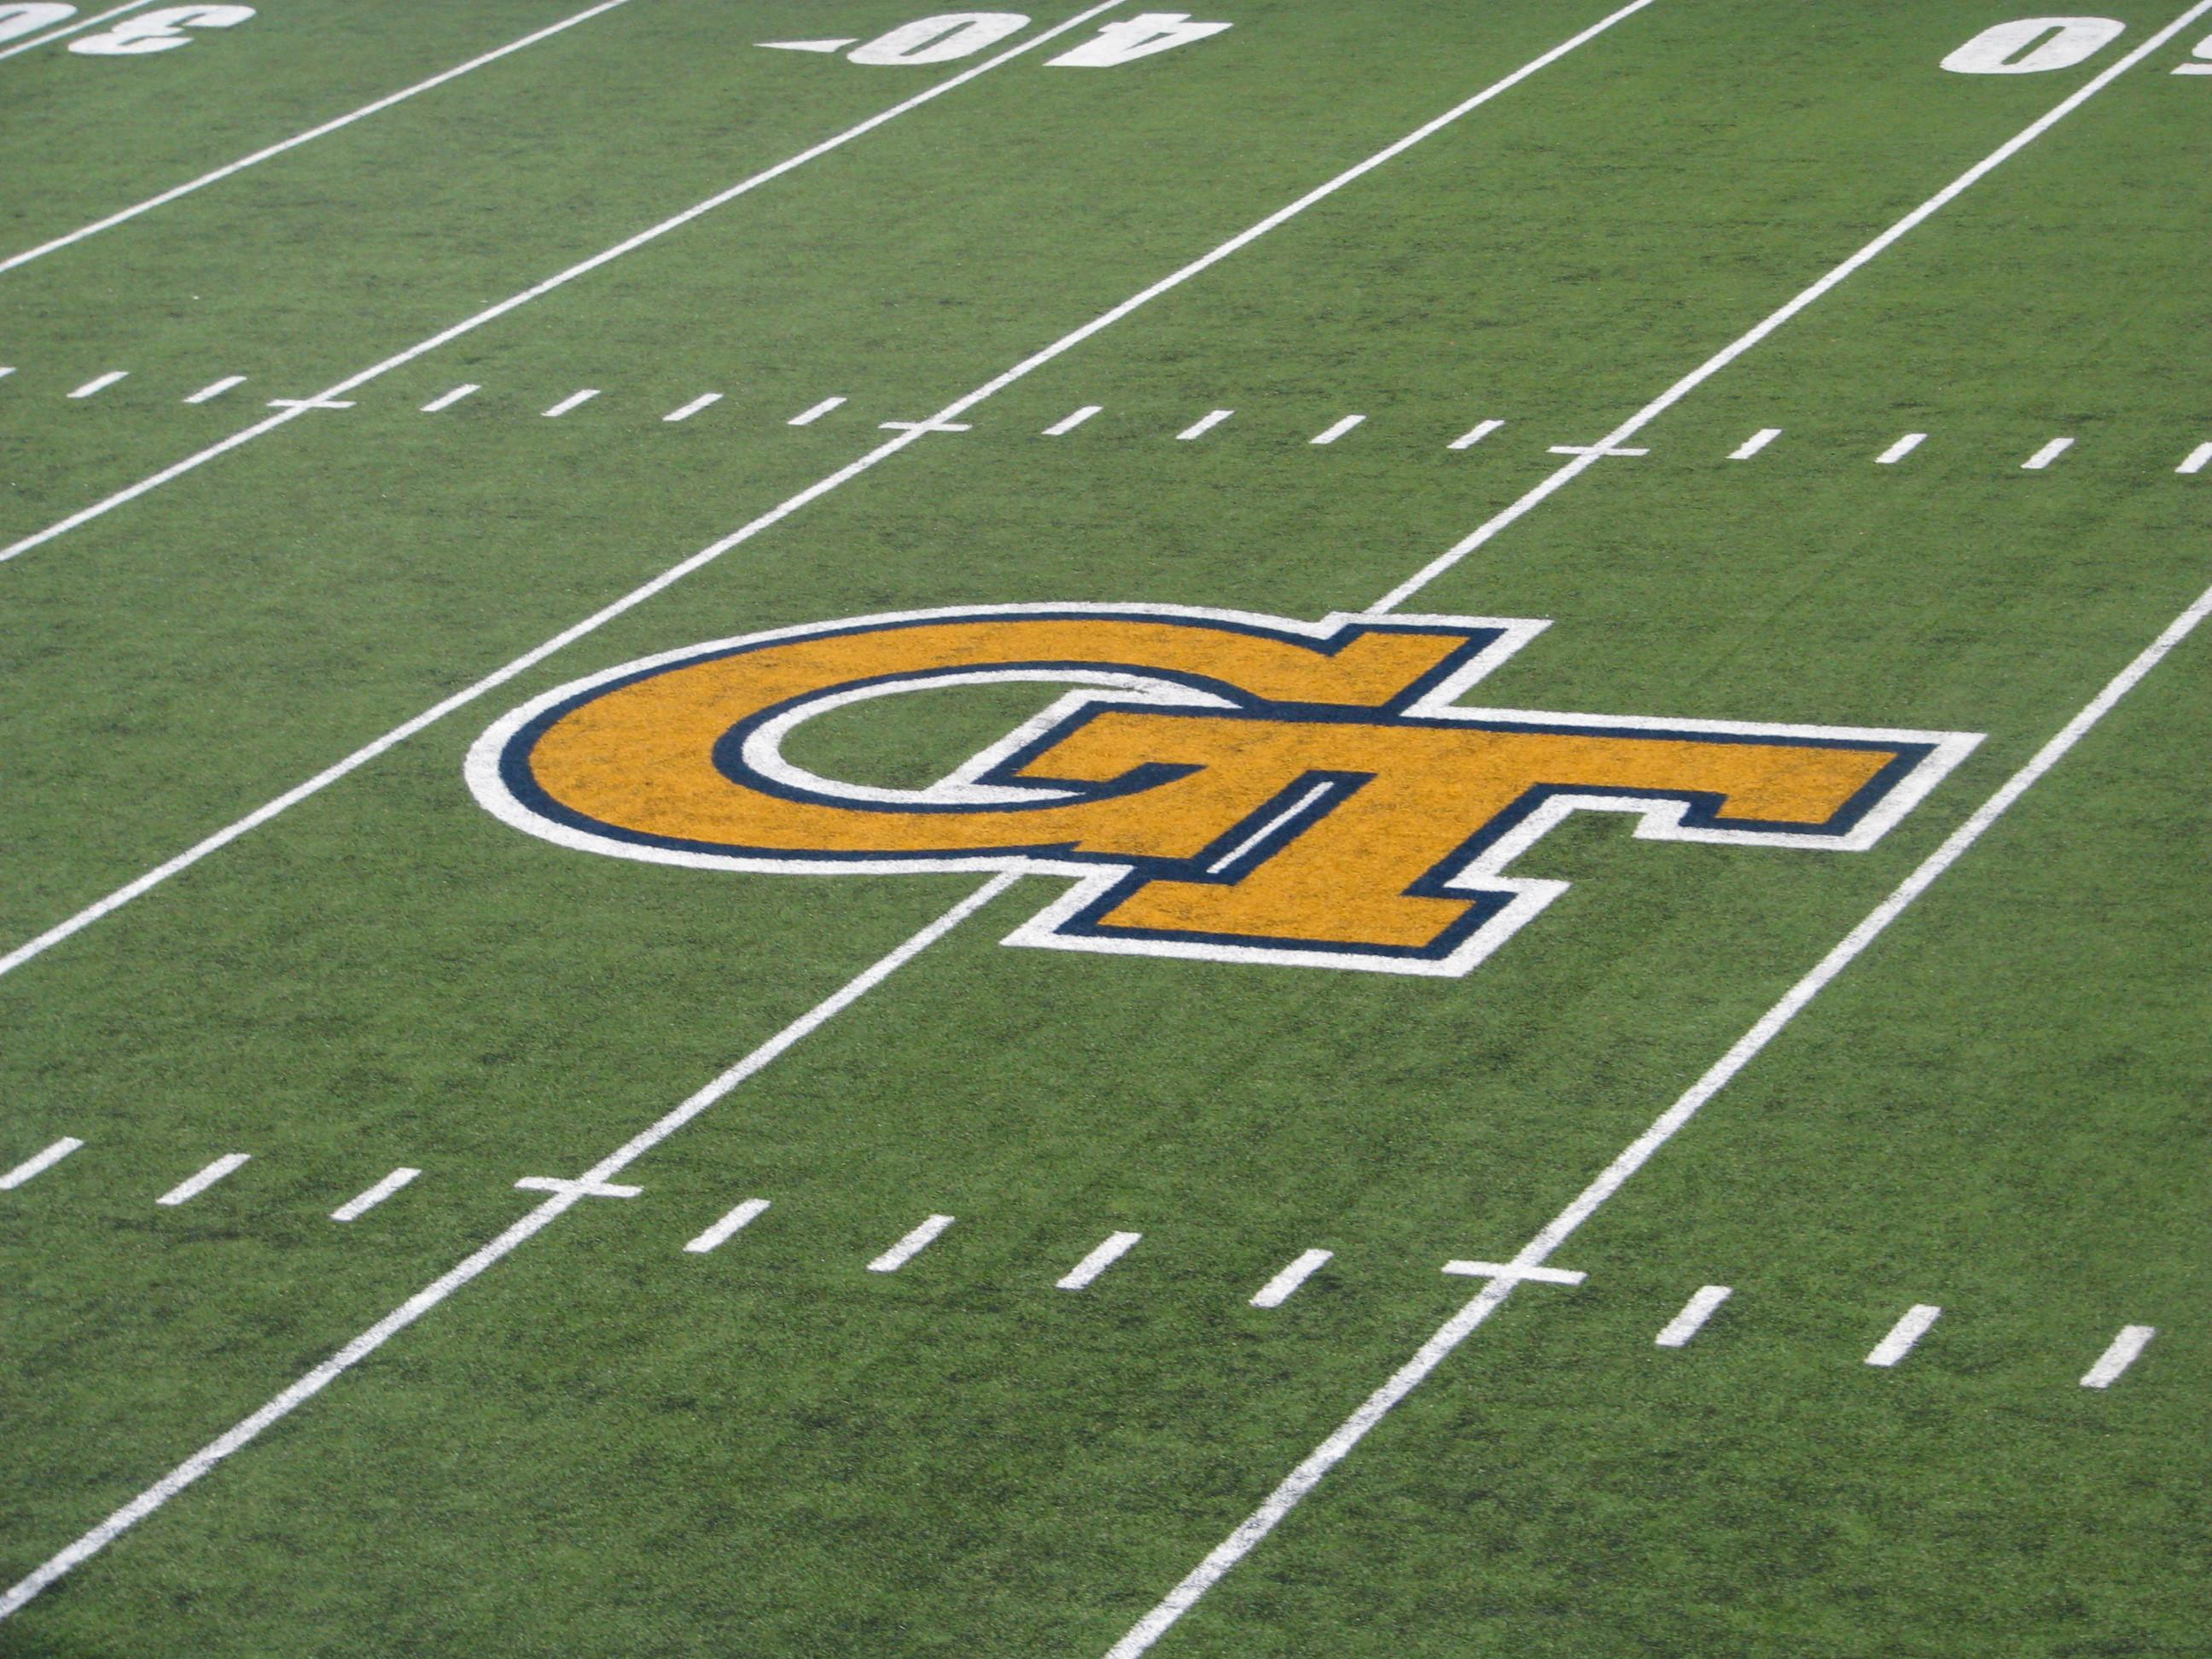 GT Logo on indoor field - Georgia Tech Football Practice - 8/24/11